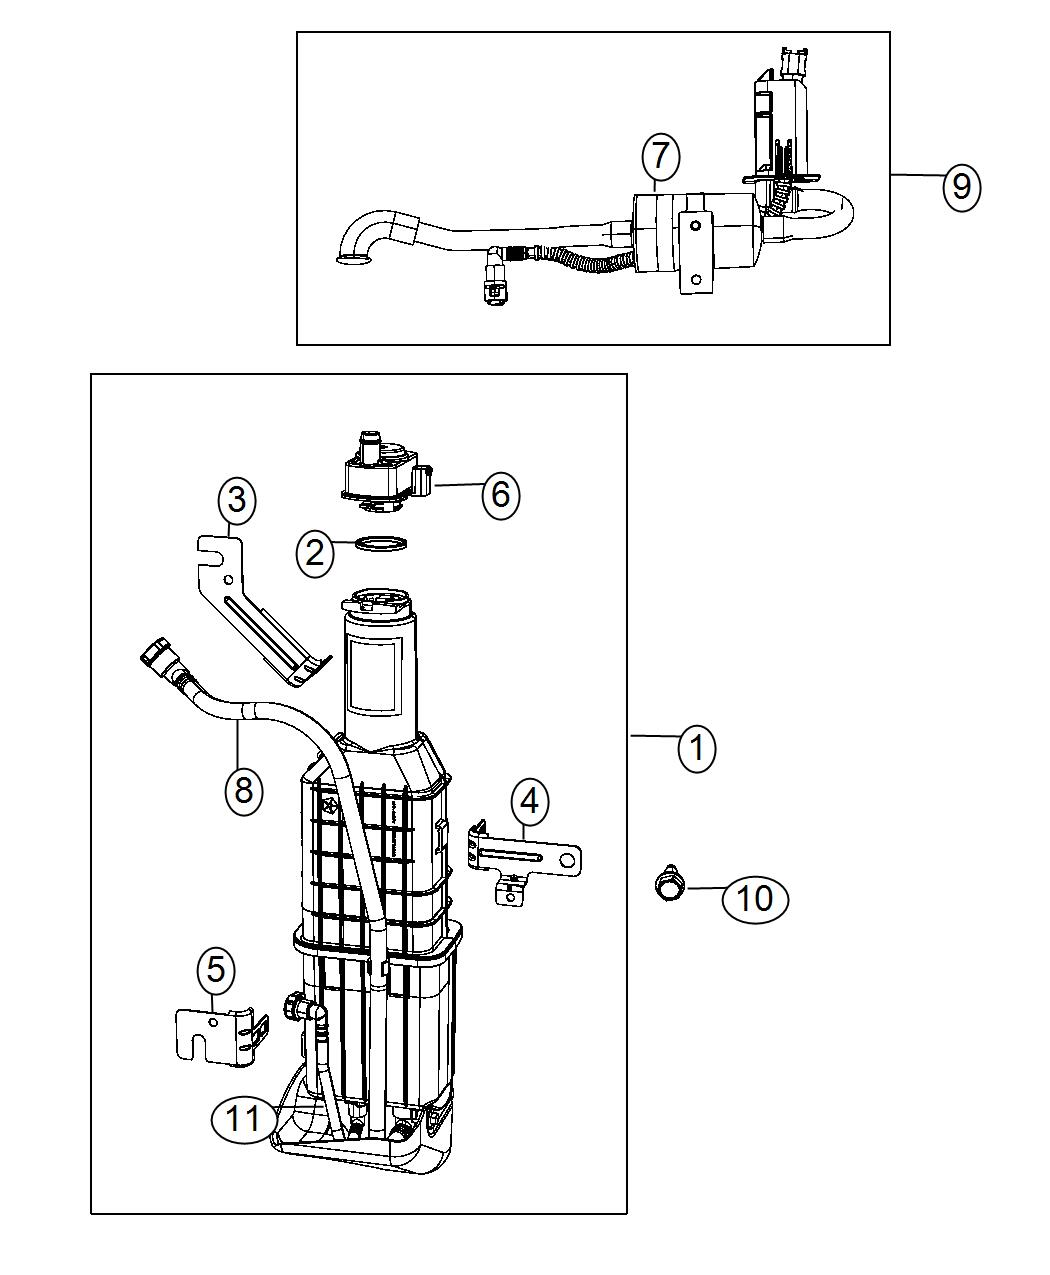 tags: #ramsel fuel filters#2012 dodge ram fuel filter#dodge truck fuel  filters#1999 jeep cherokee sport fuel filter#dodge ramsel fuel filter#dodge  ram fuel